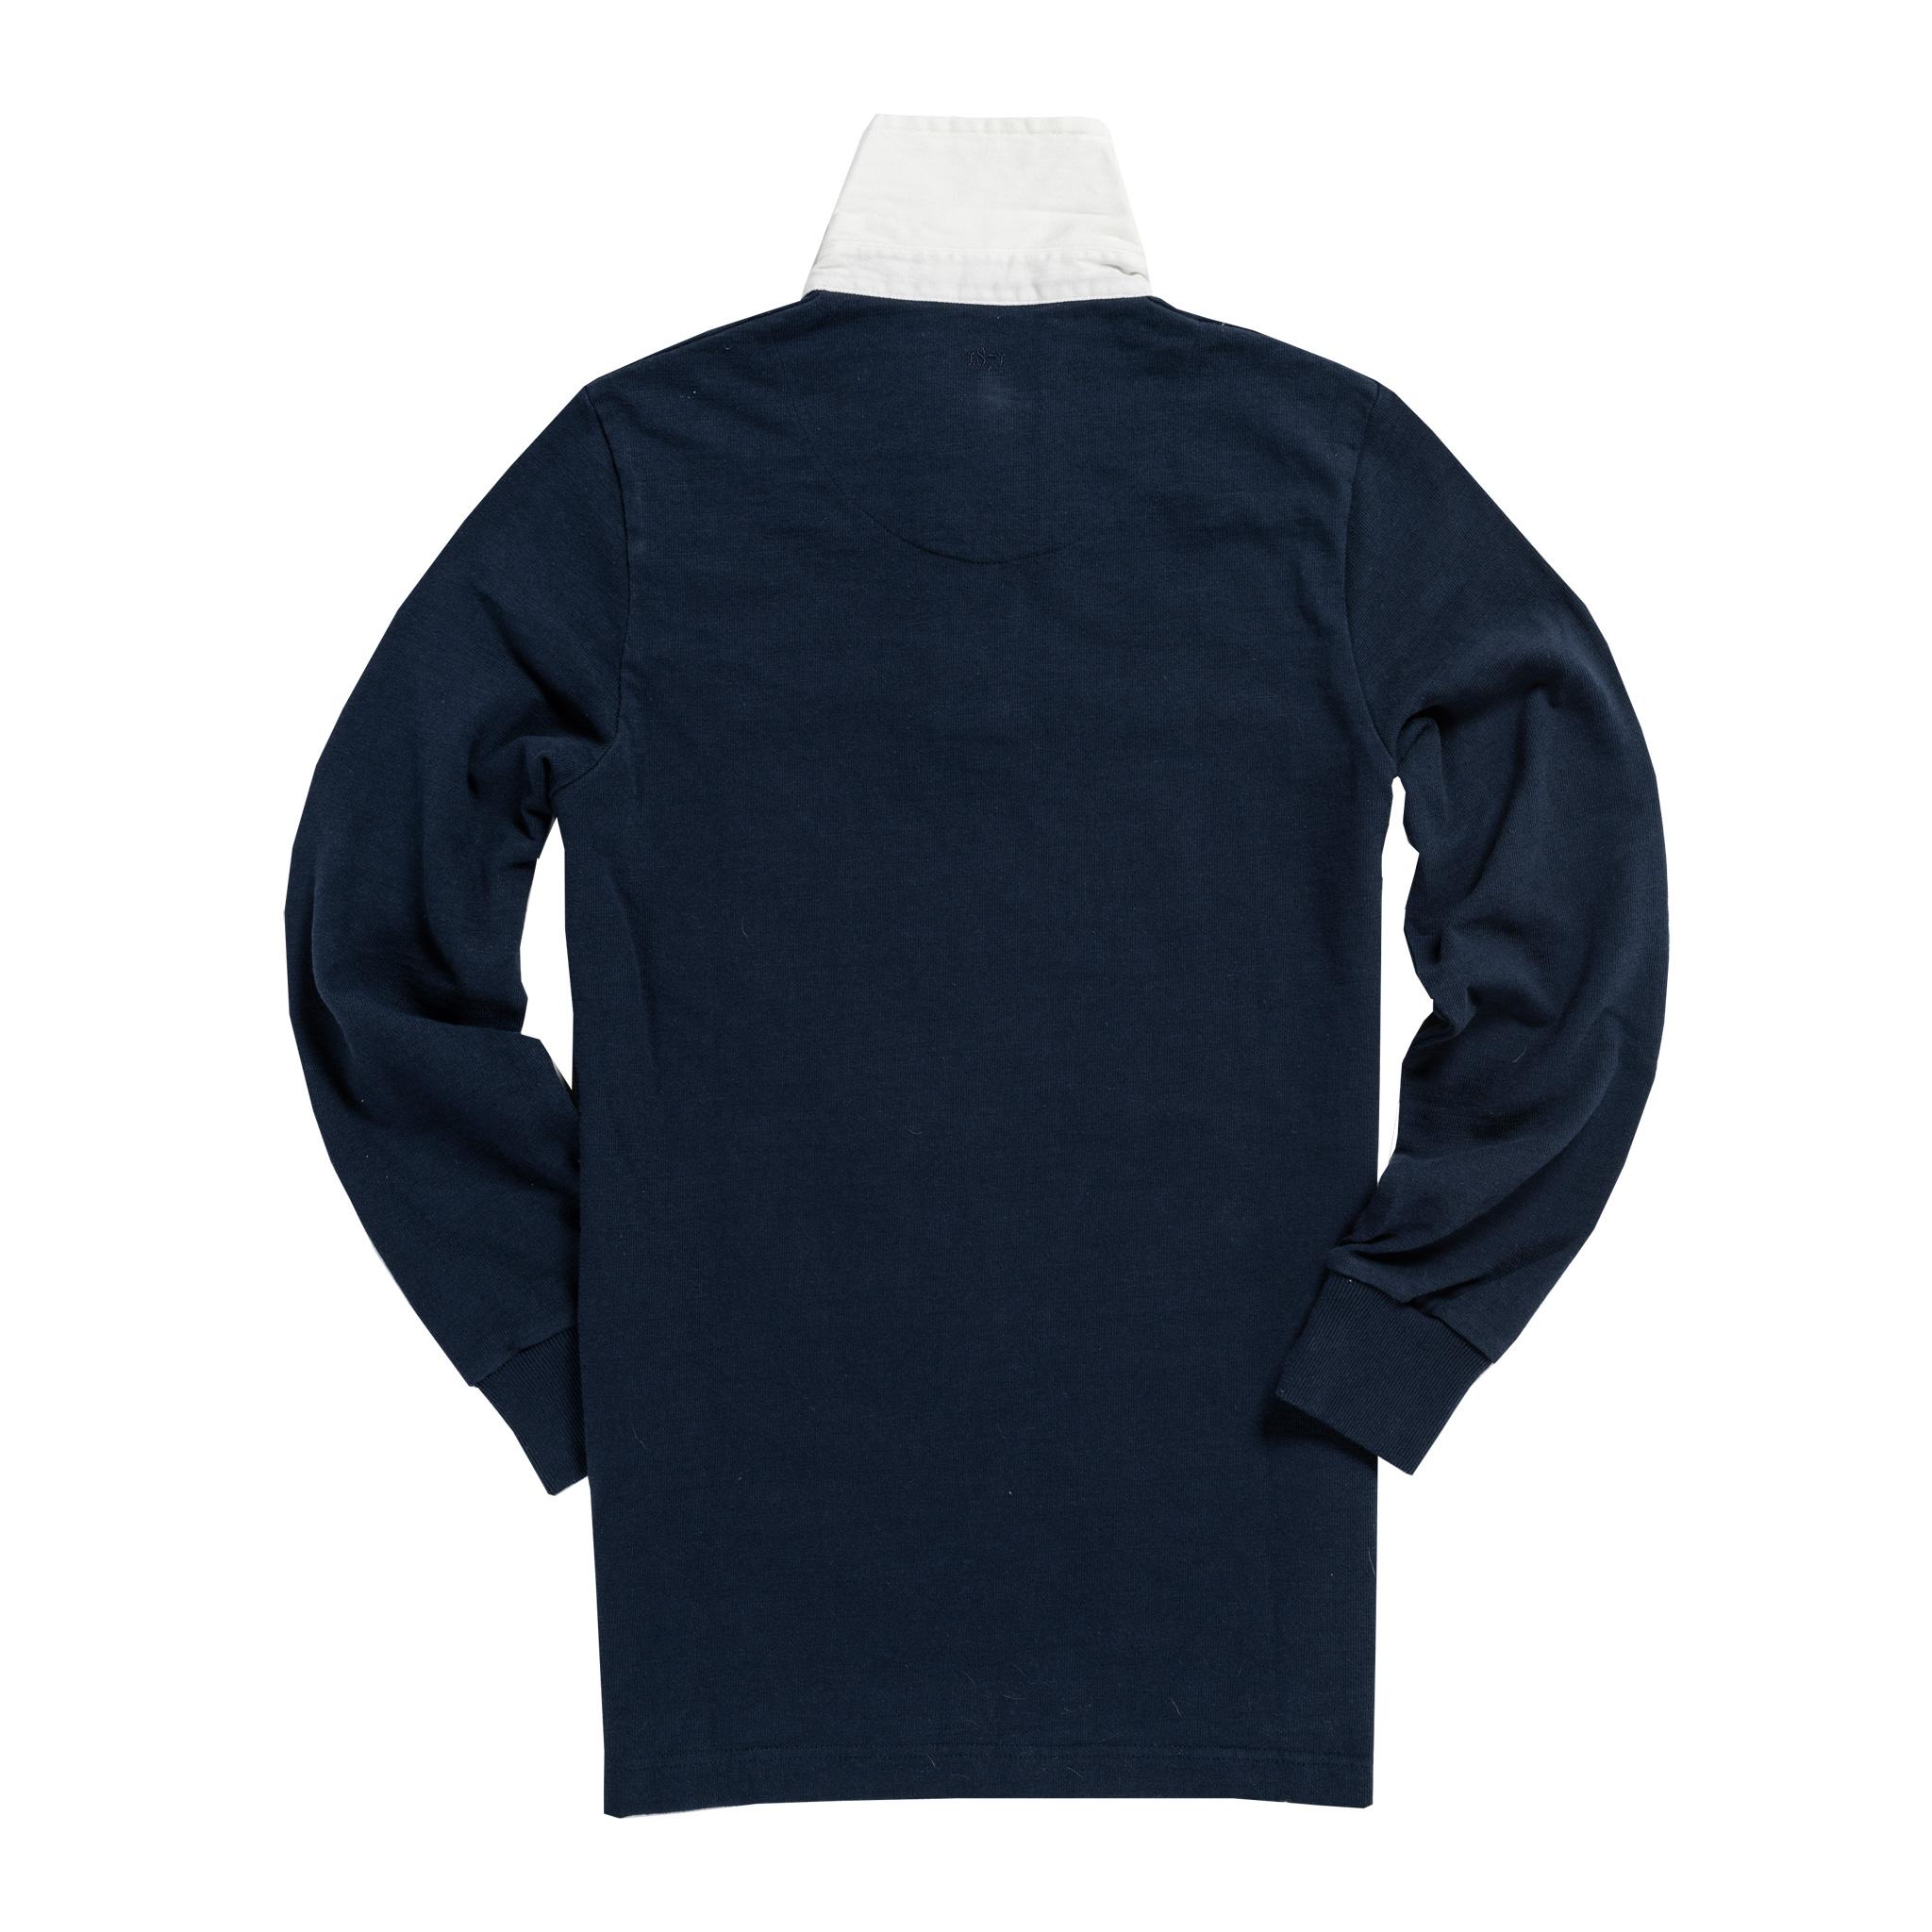 Women's Scotland 1871 Vintage Rugby Shirt